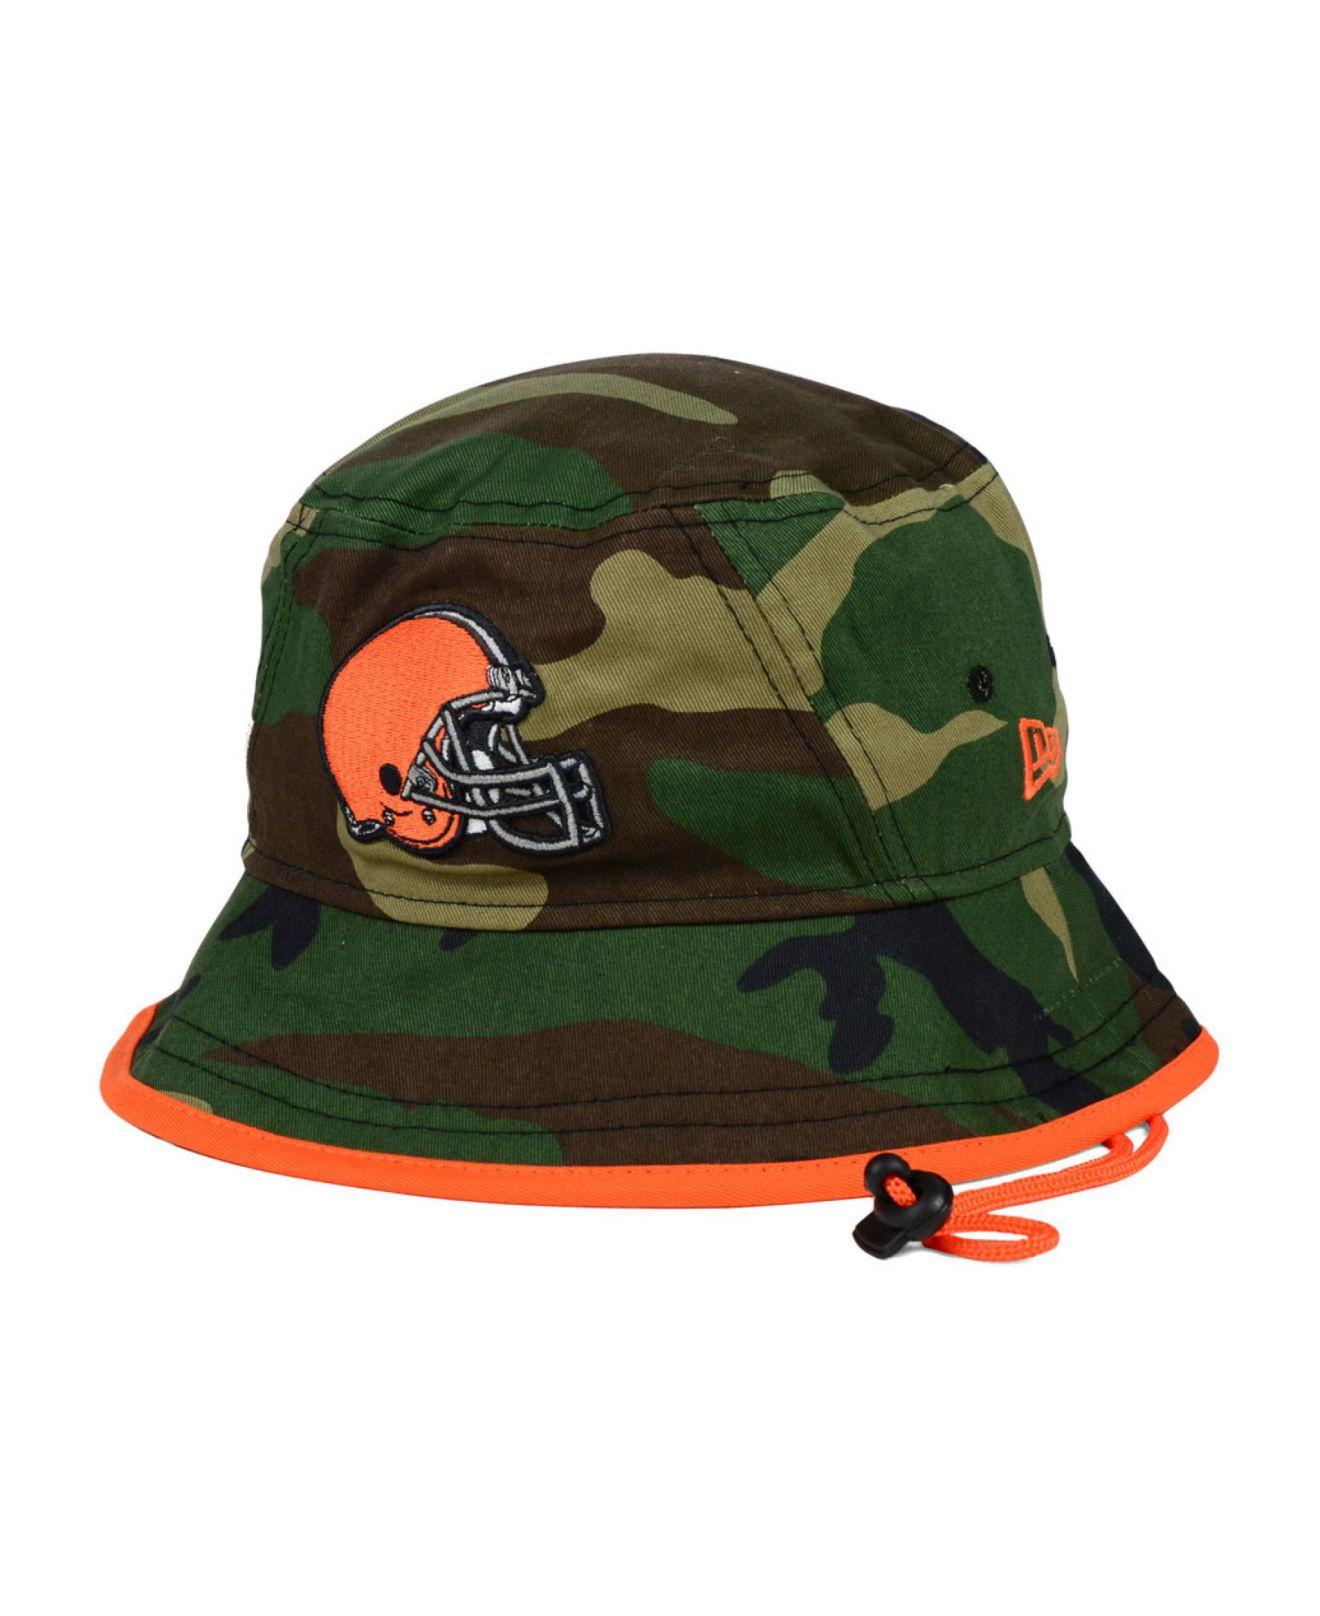 ... denmark lyst ktz cleveland browns camo pop bucket hat in green for men  59432 79053 fb2d4a288